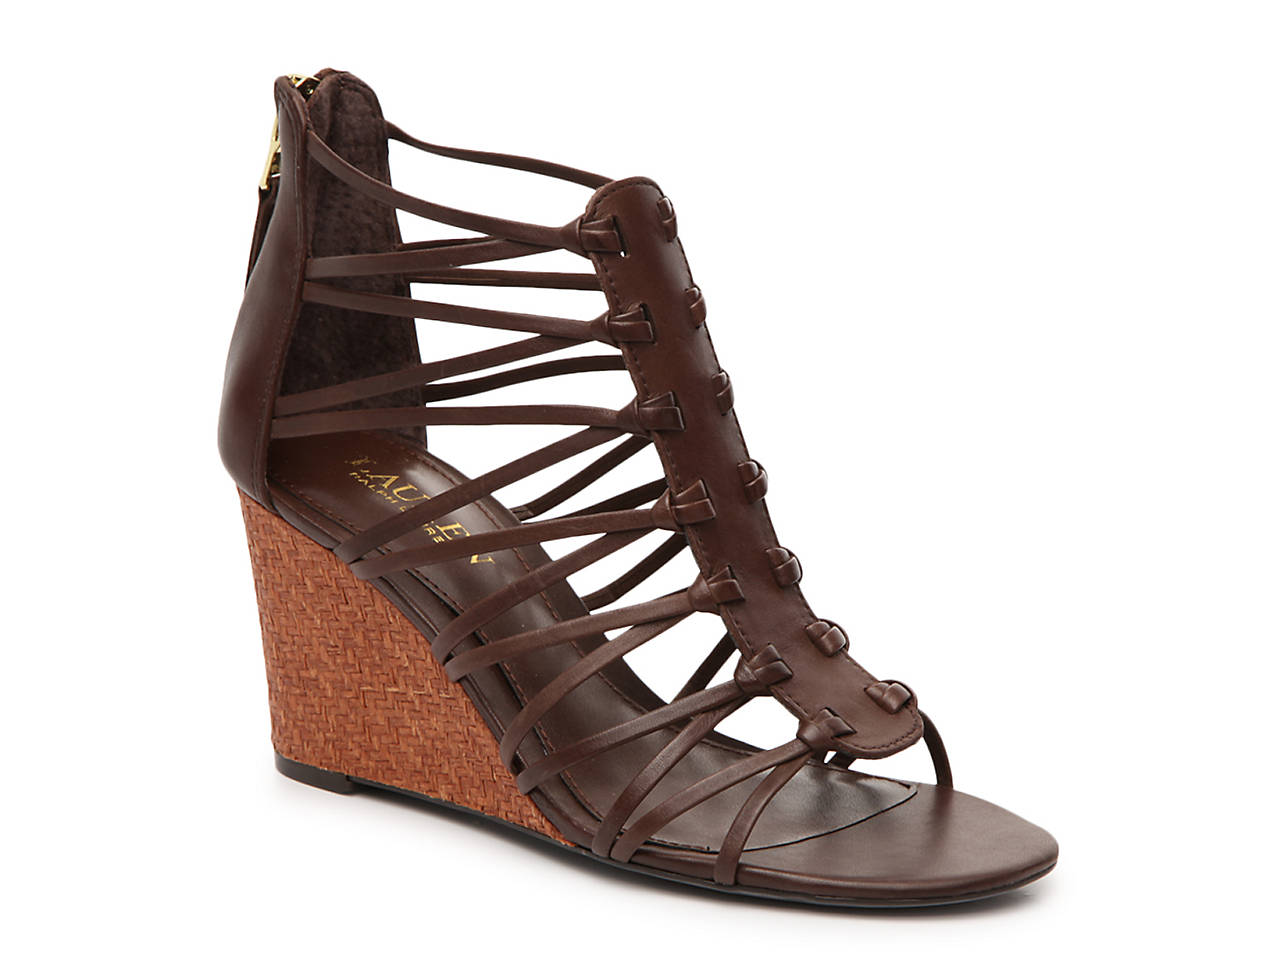 Lauren Ralph Lauren Leather Wedge Sandals Clearance Order Ebay For Sale Cost 31NNgu